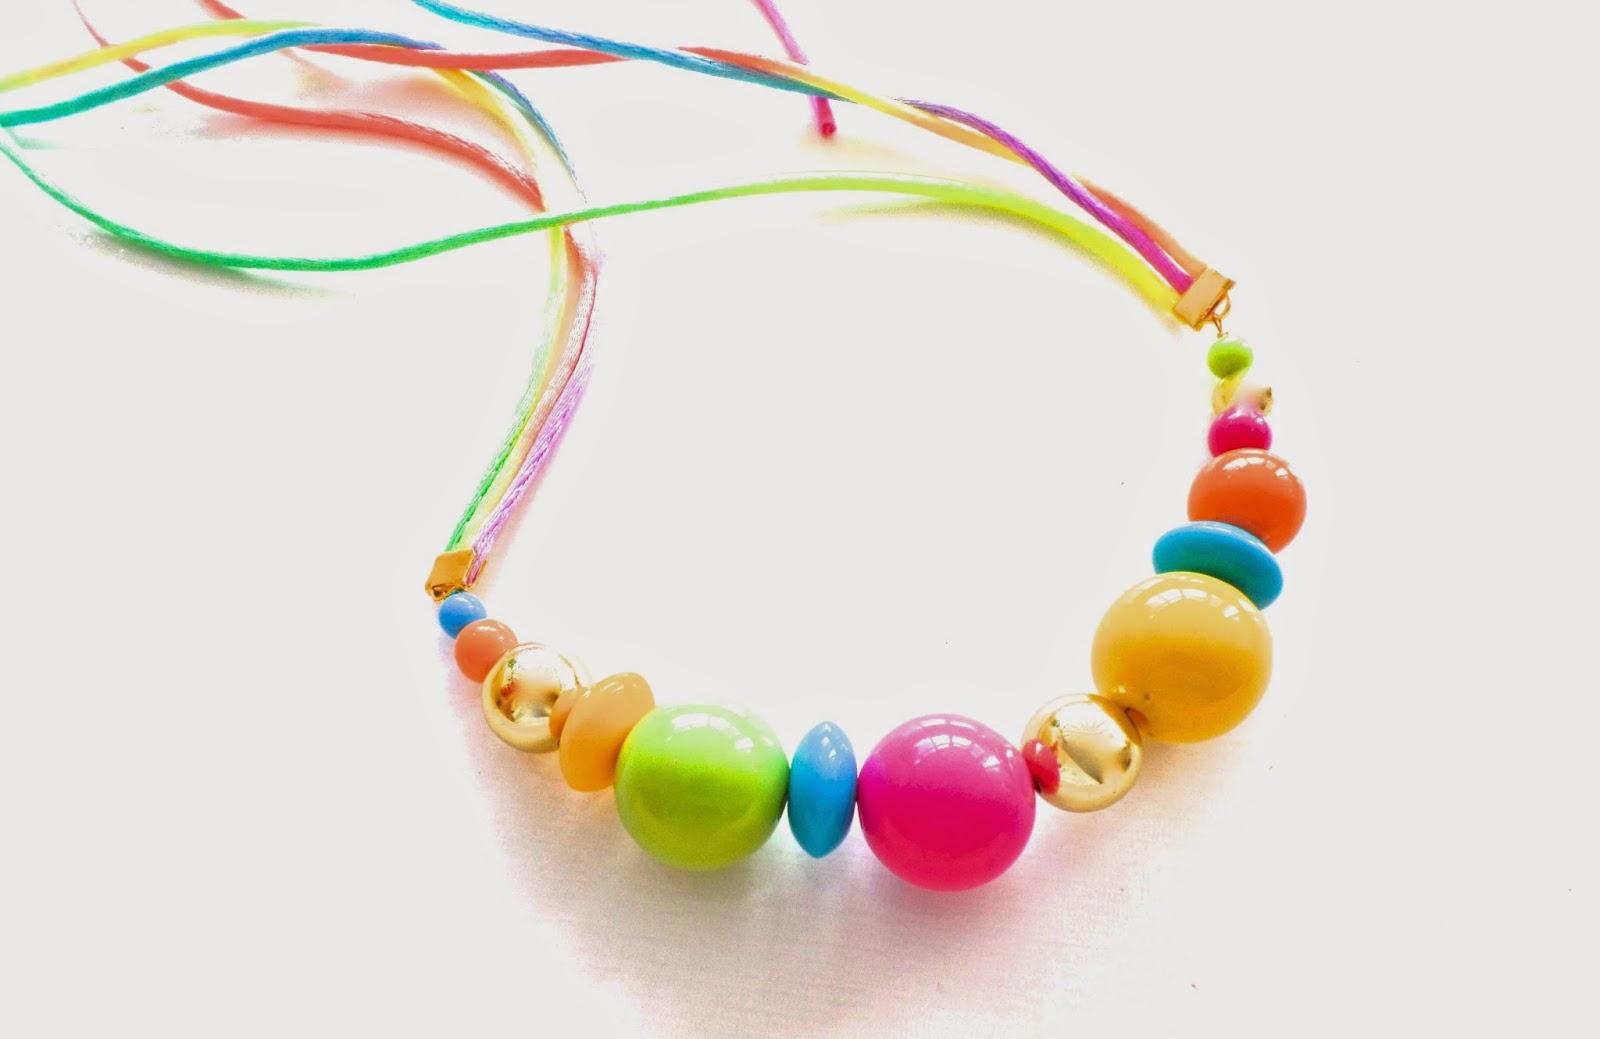 fashion necklace neon